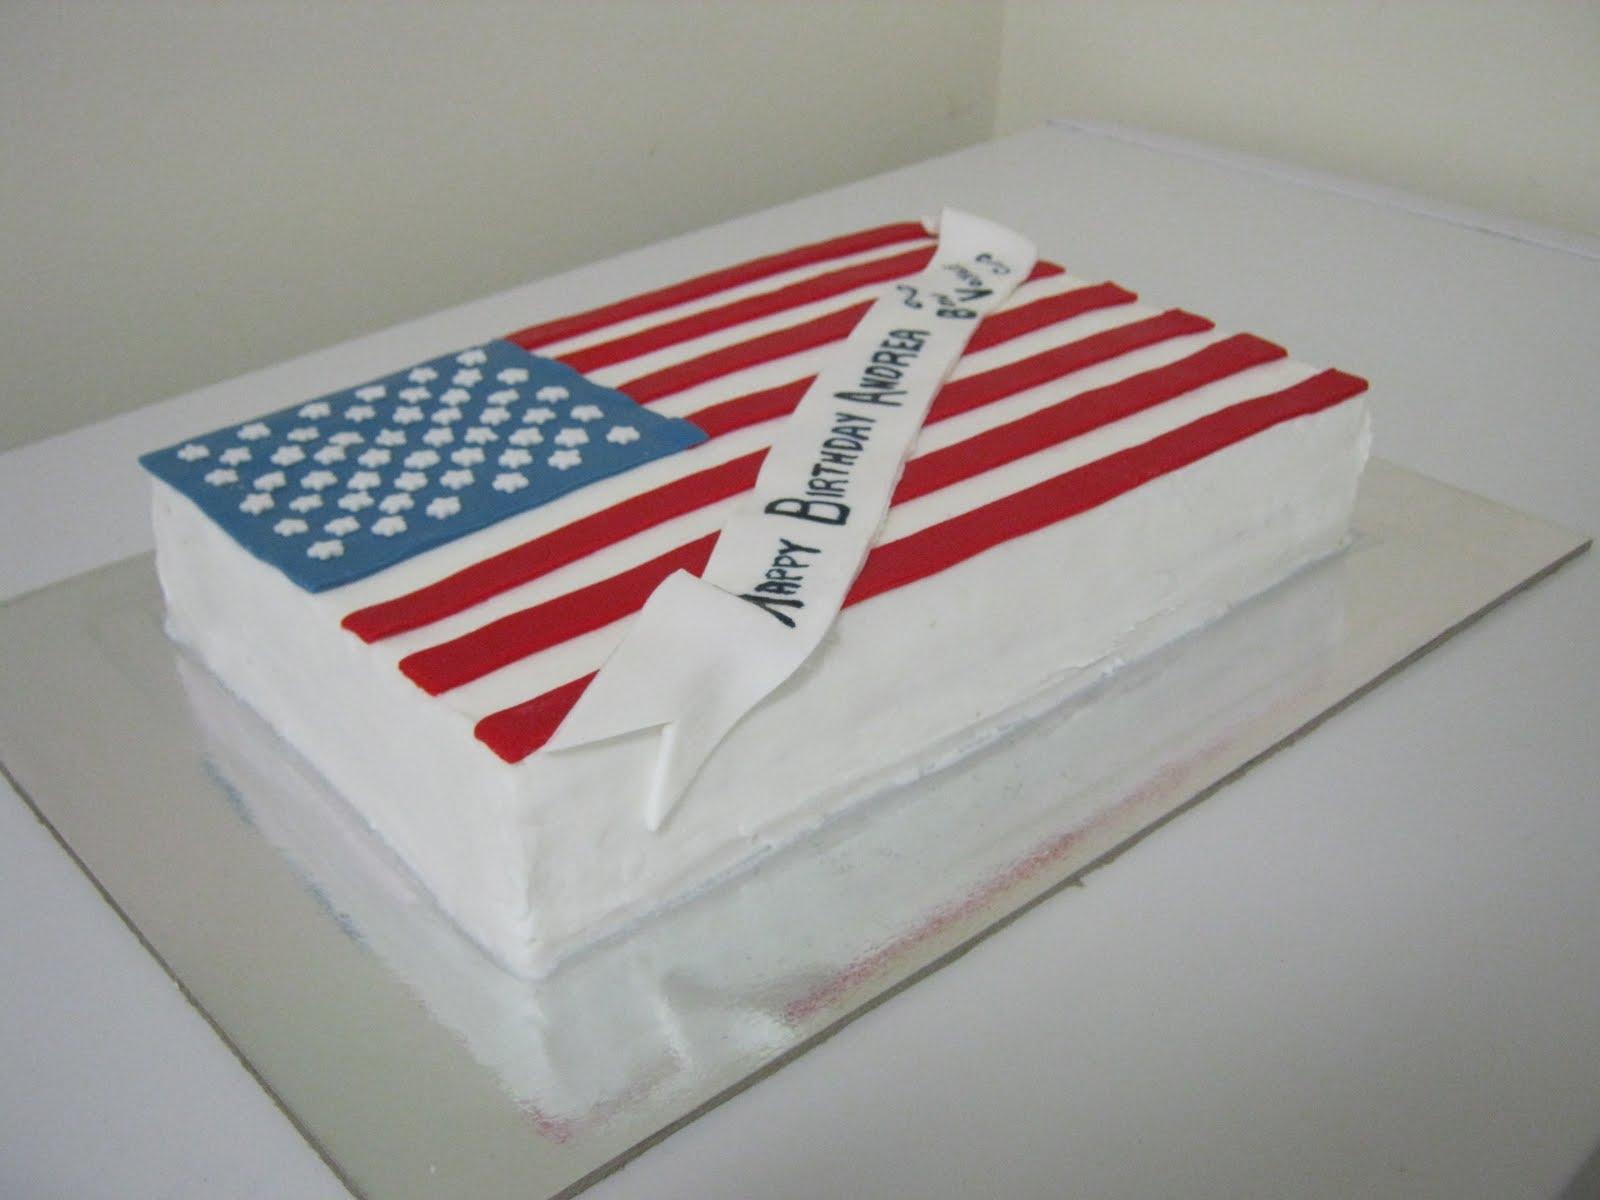 Driftwood Cakes - Cake Baker and Decorator: American Flag Cake